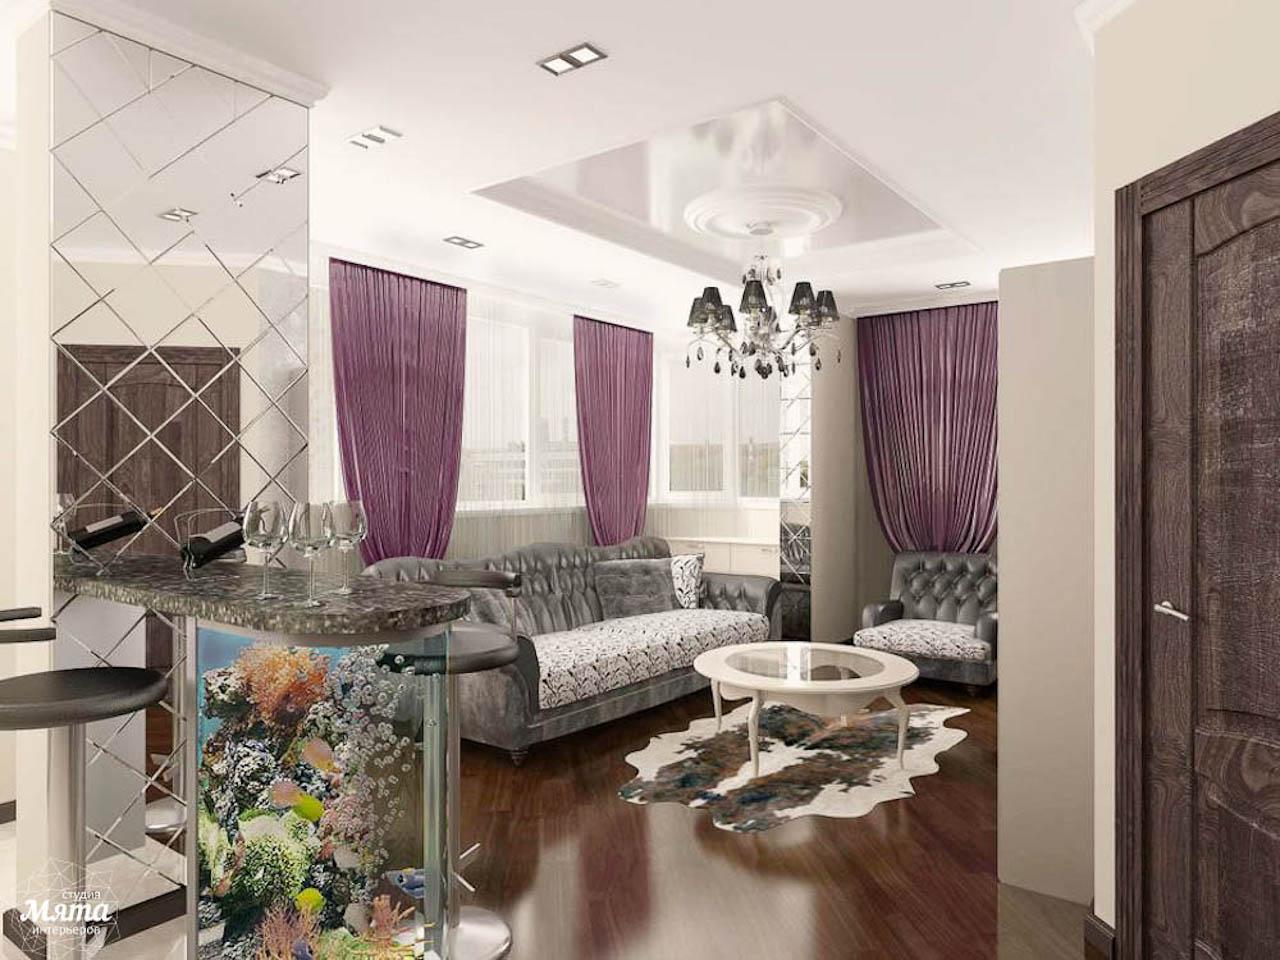 Дизайн интерьера двухкомнатной квартиры по ул. Юмашева 10 img2137566102